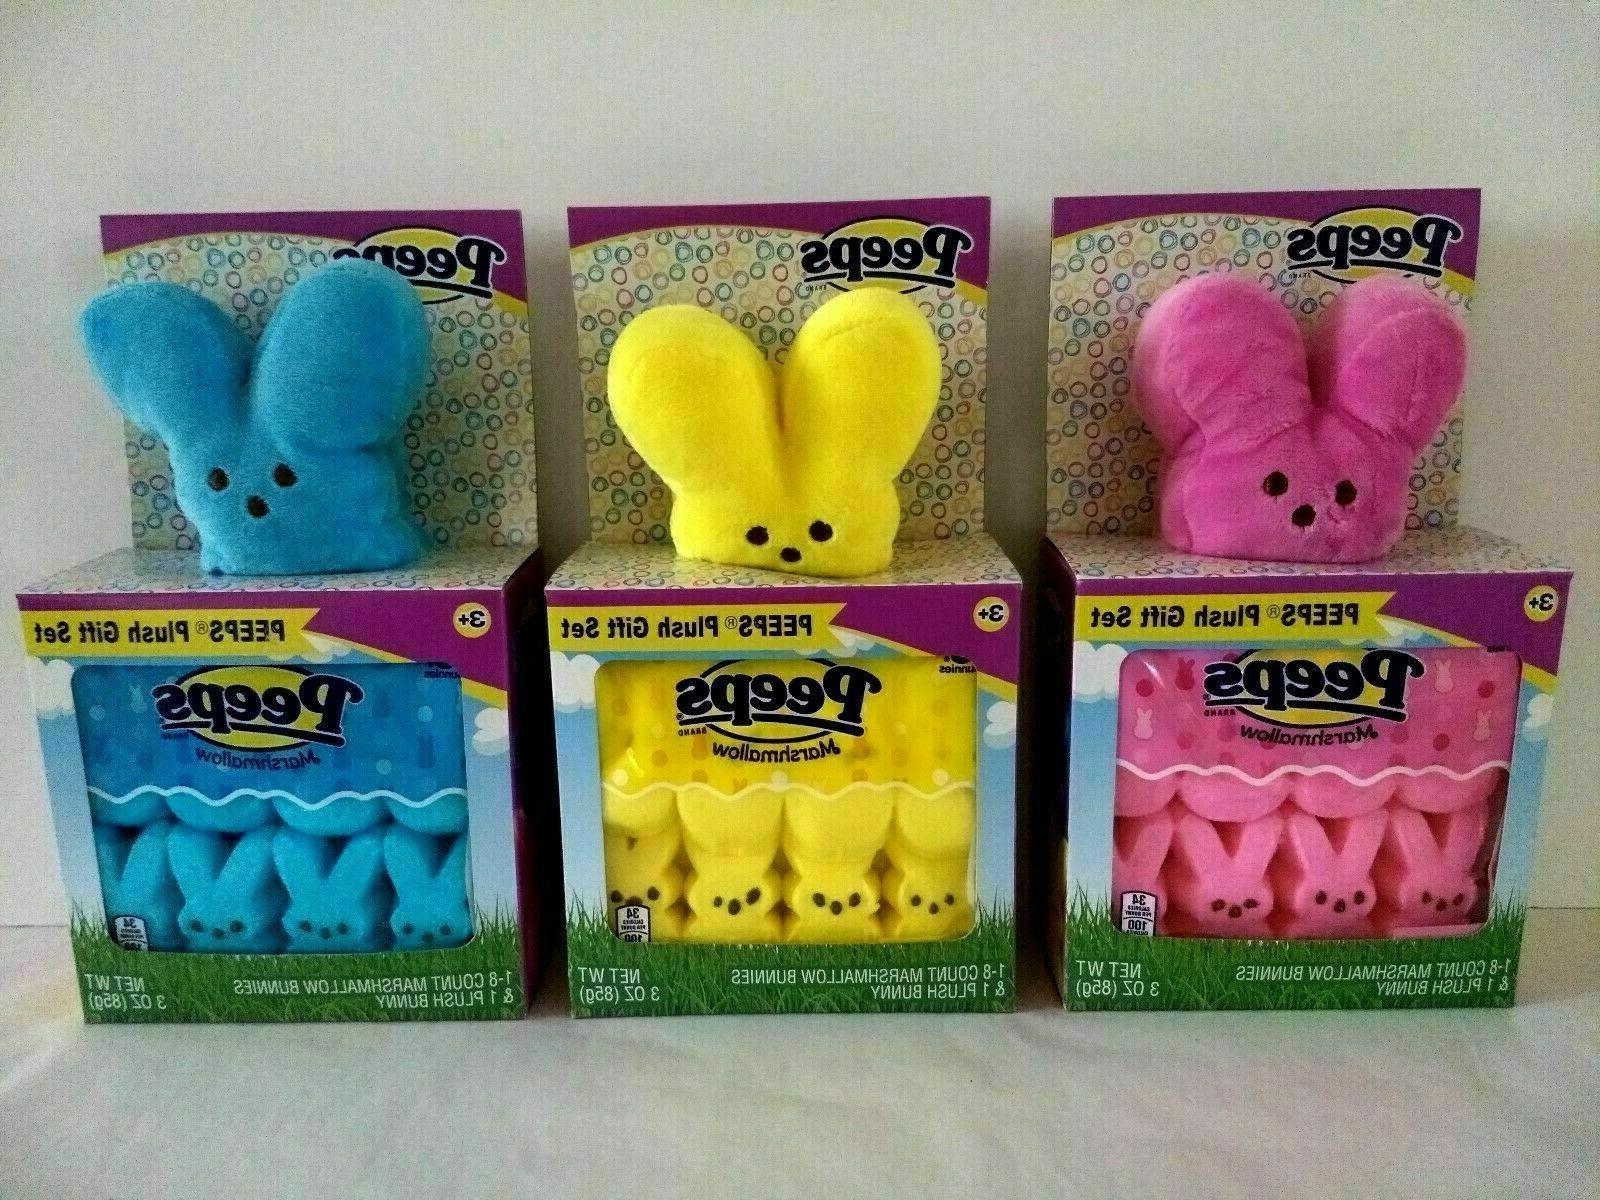 easter bunny plush gift set with edible